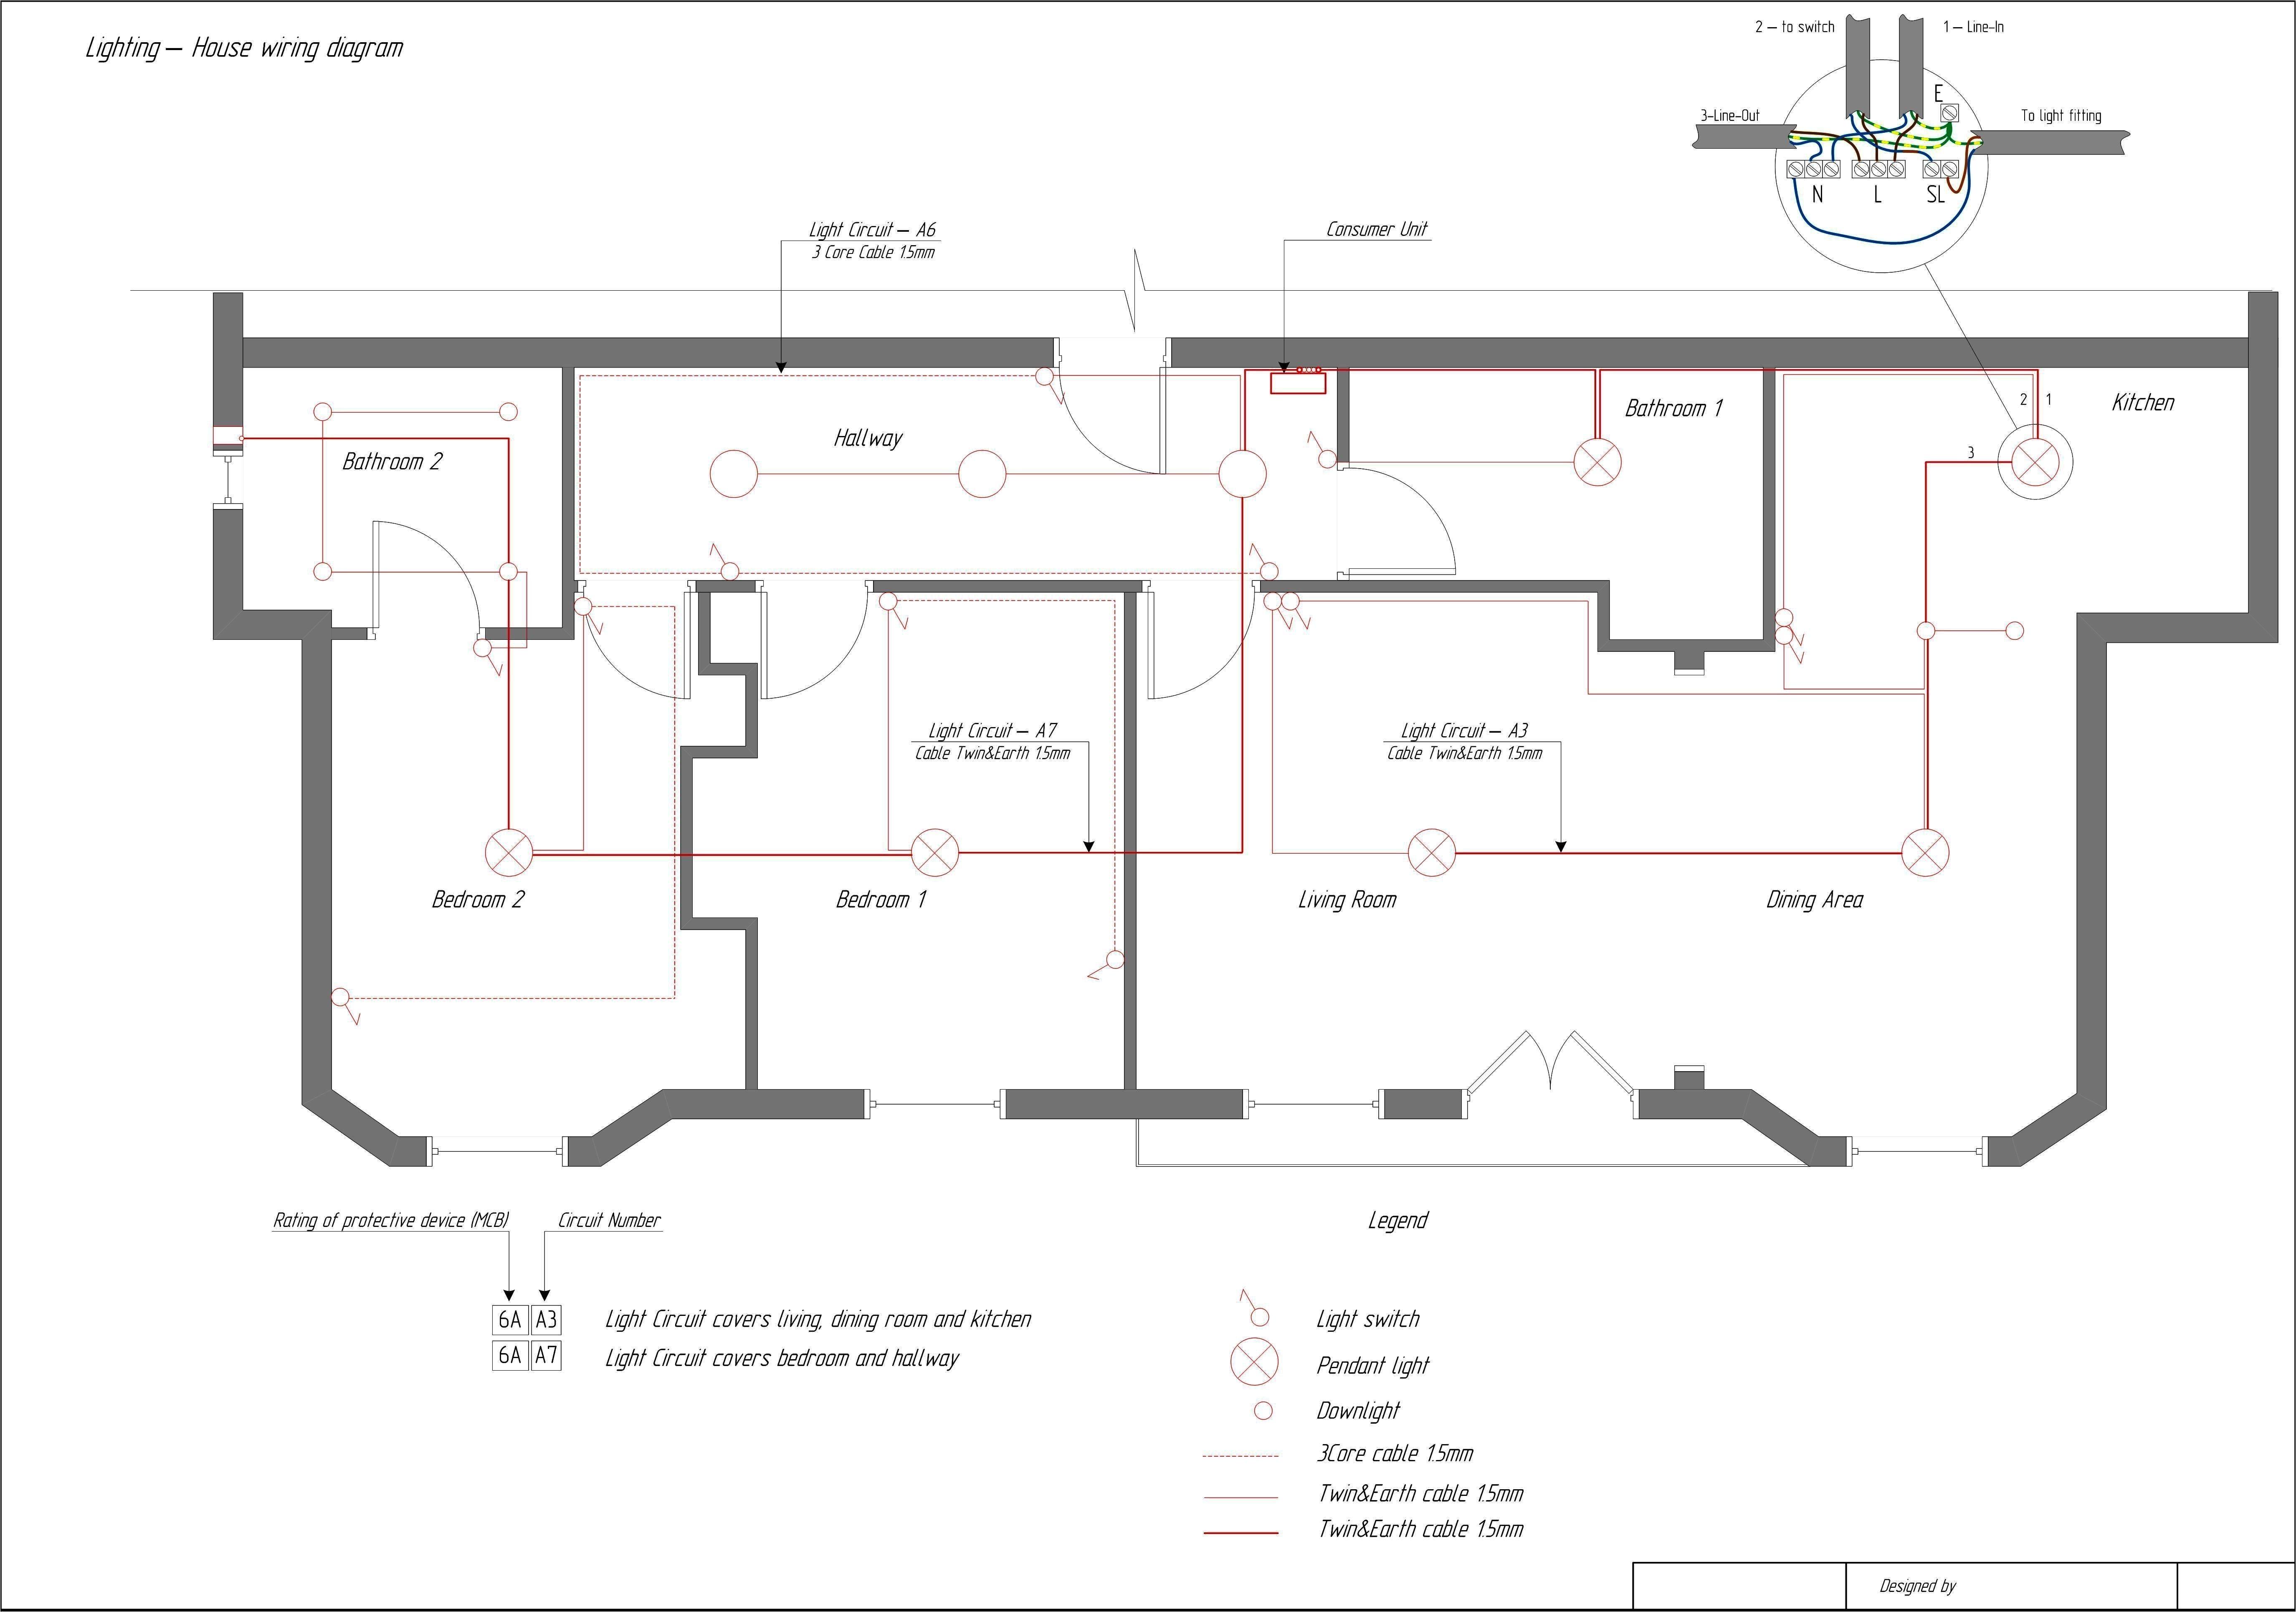 Simple House Wiring Diagram 23 Fancy Electrical Floor Plan Decoration Floor Plan Design